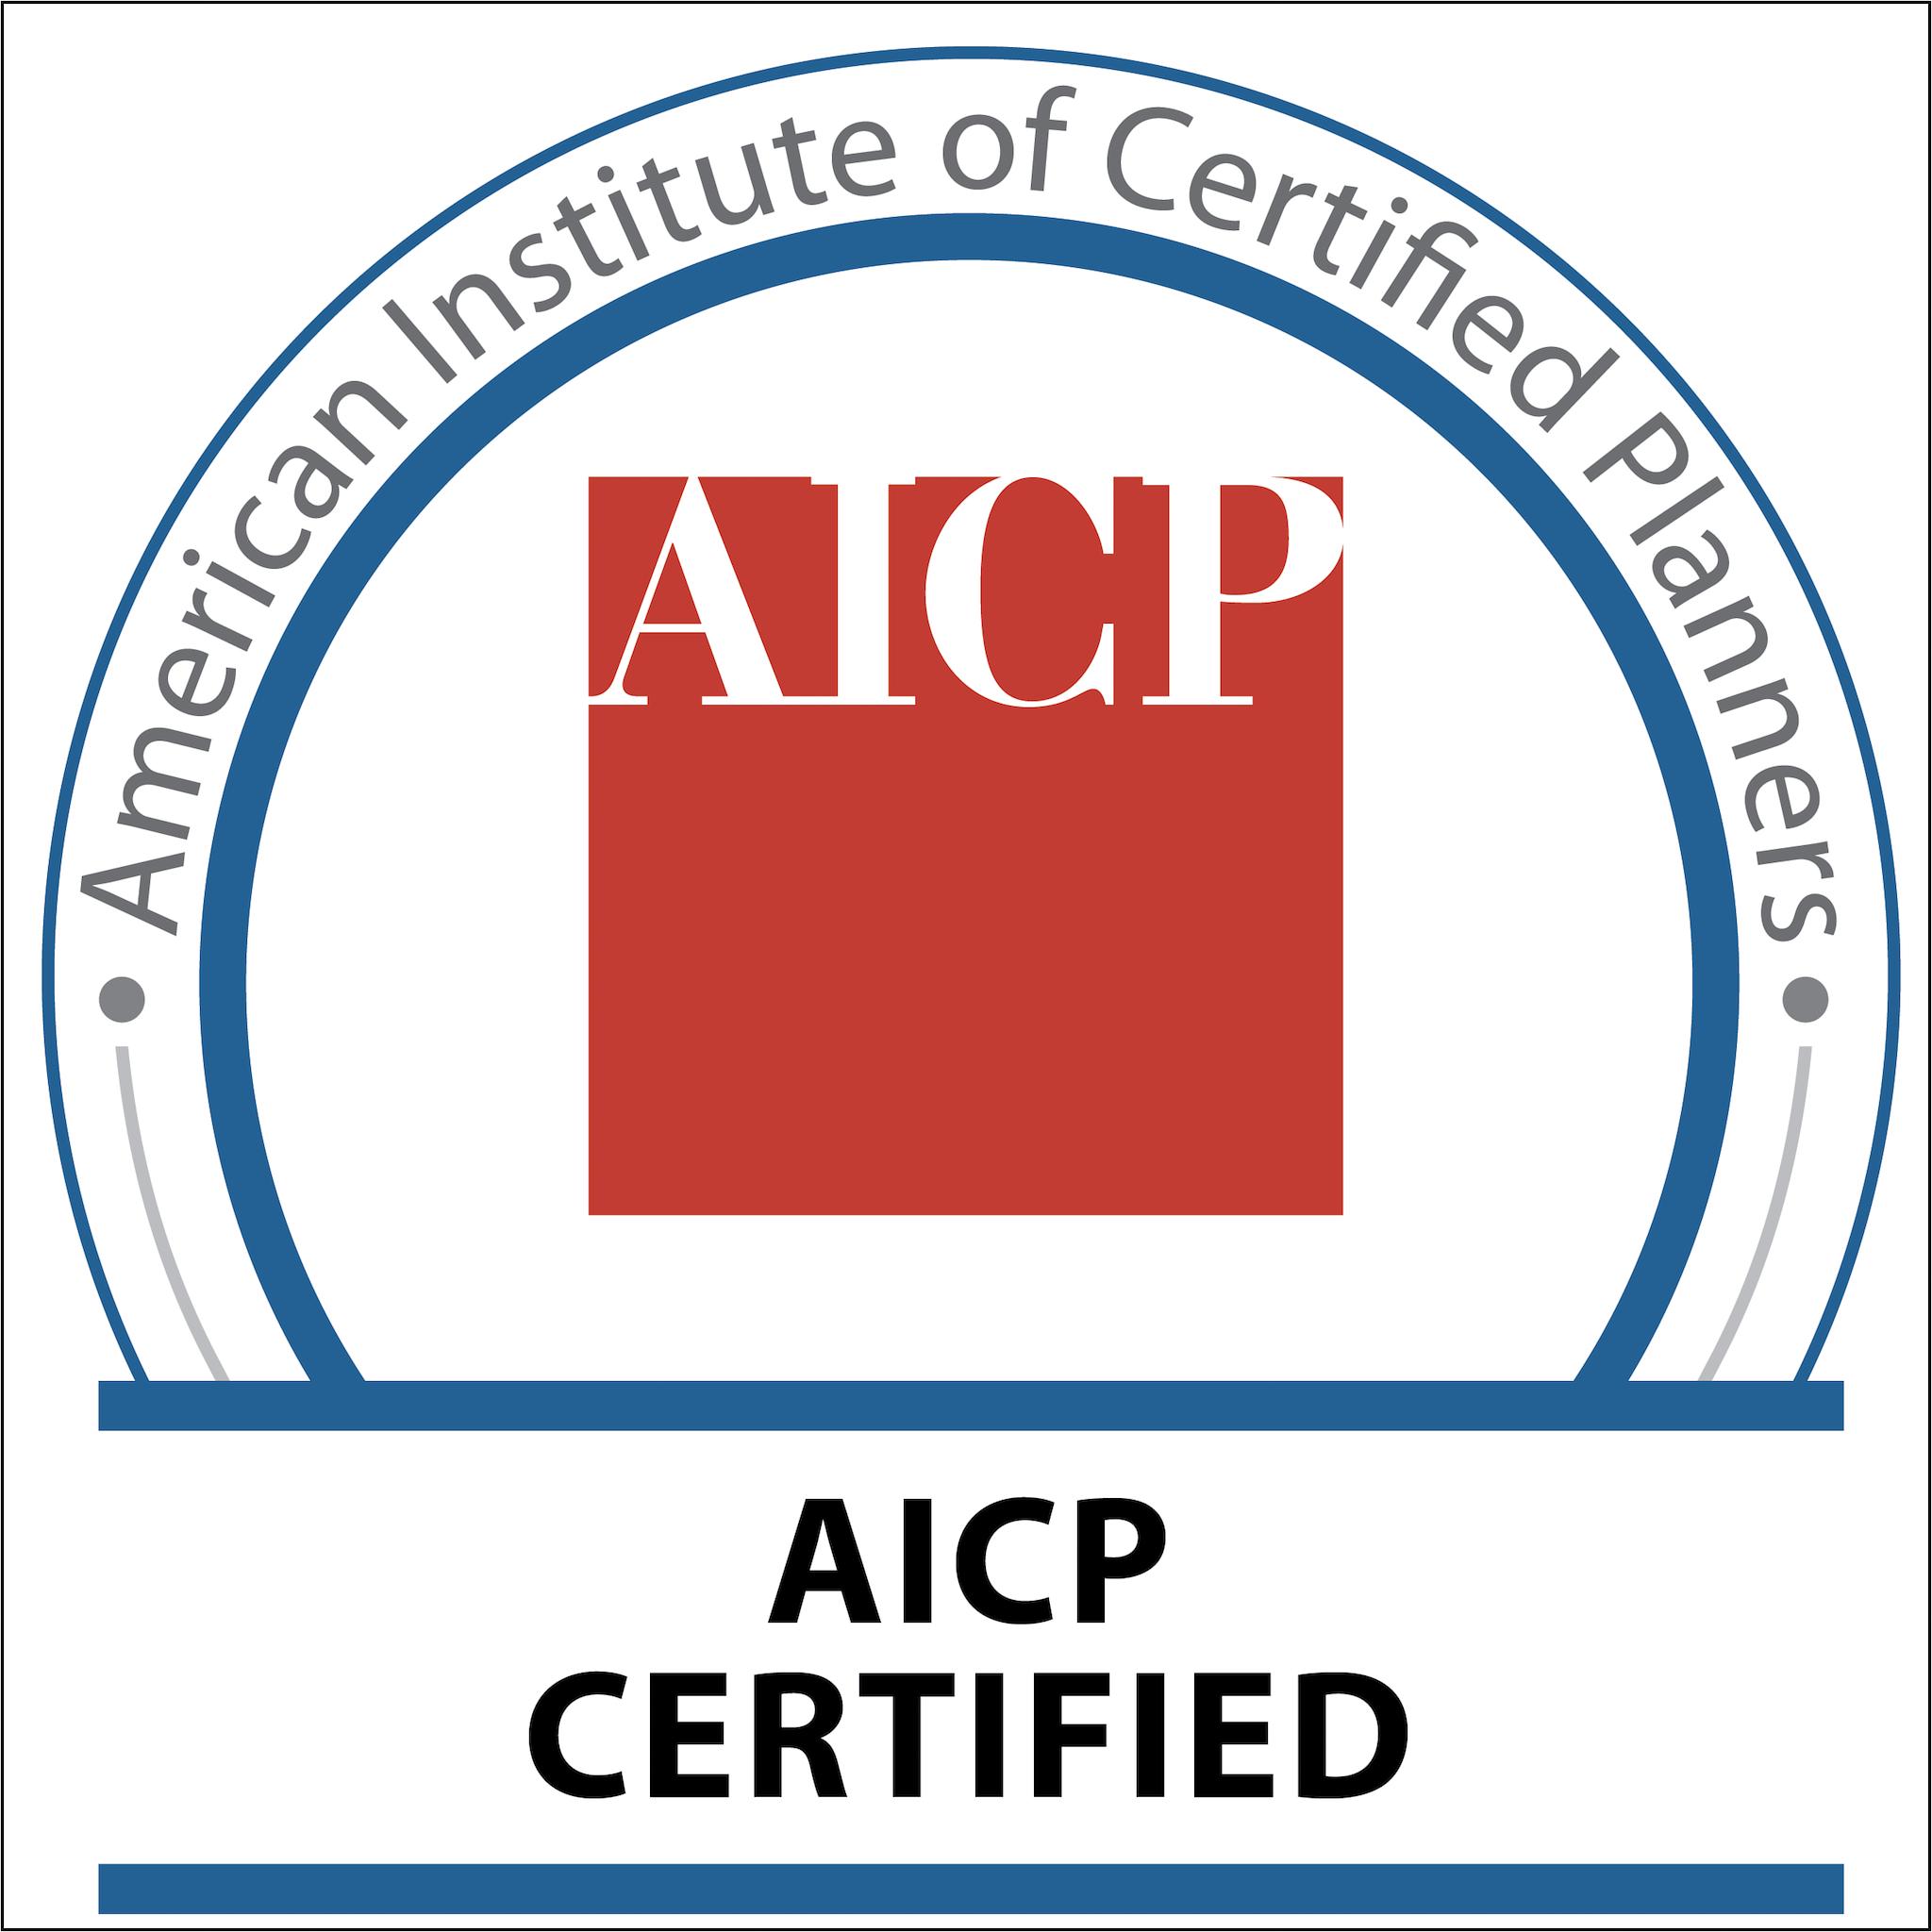 AICP Certified